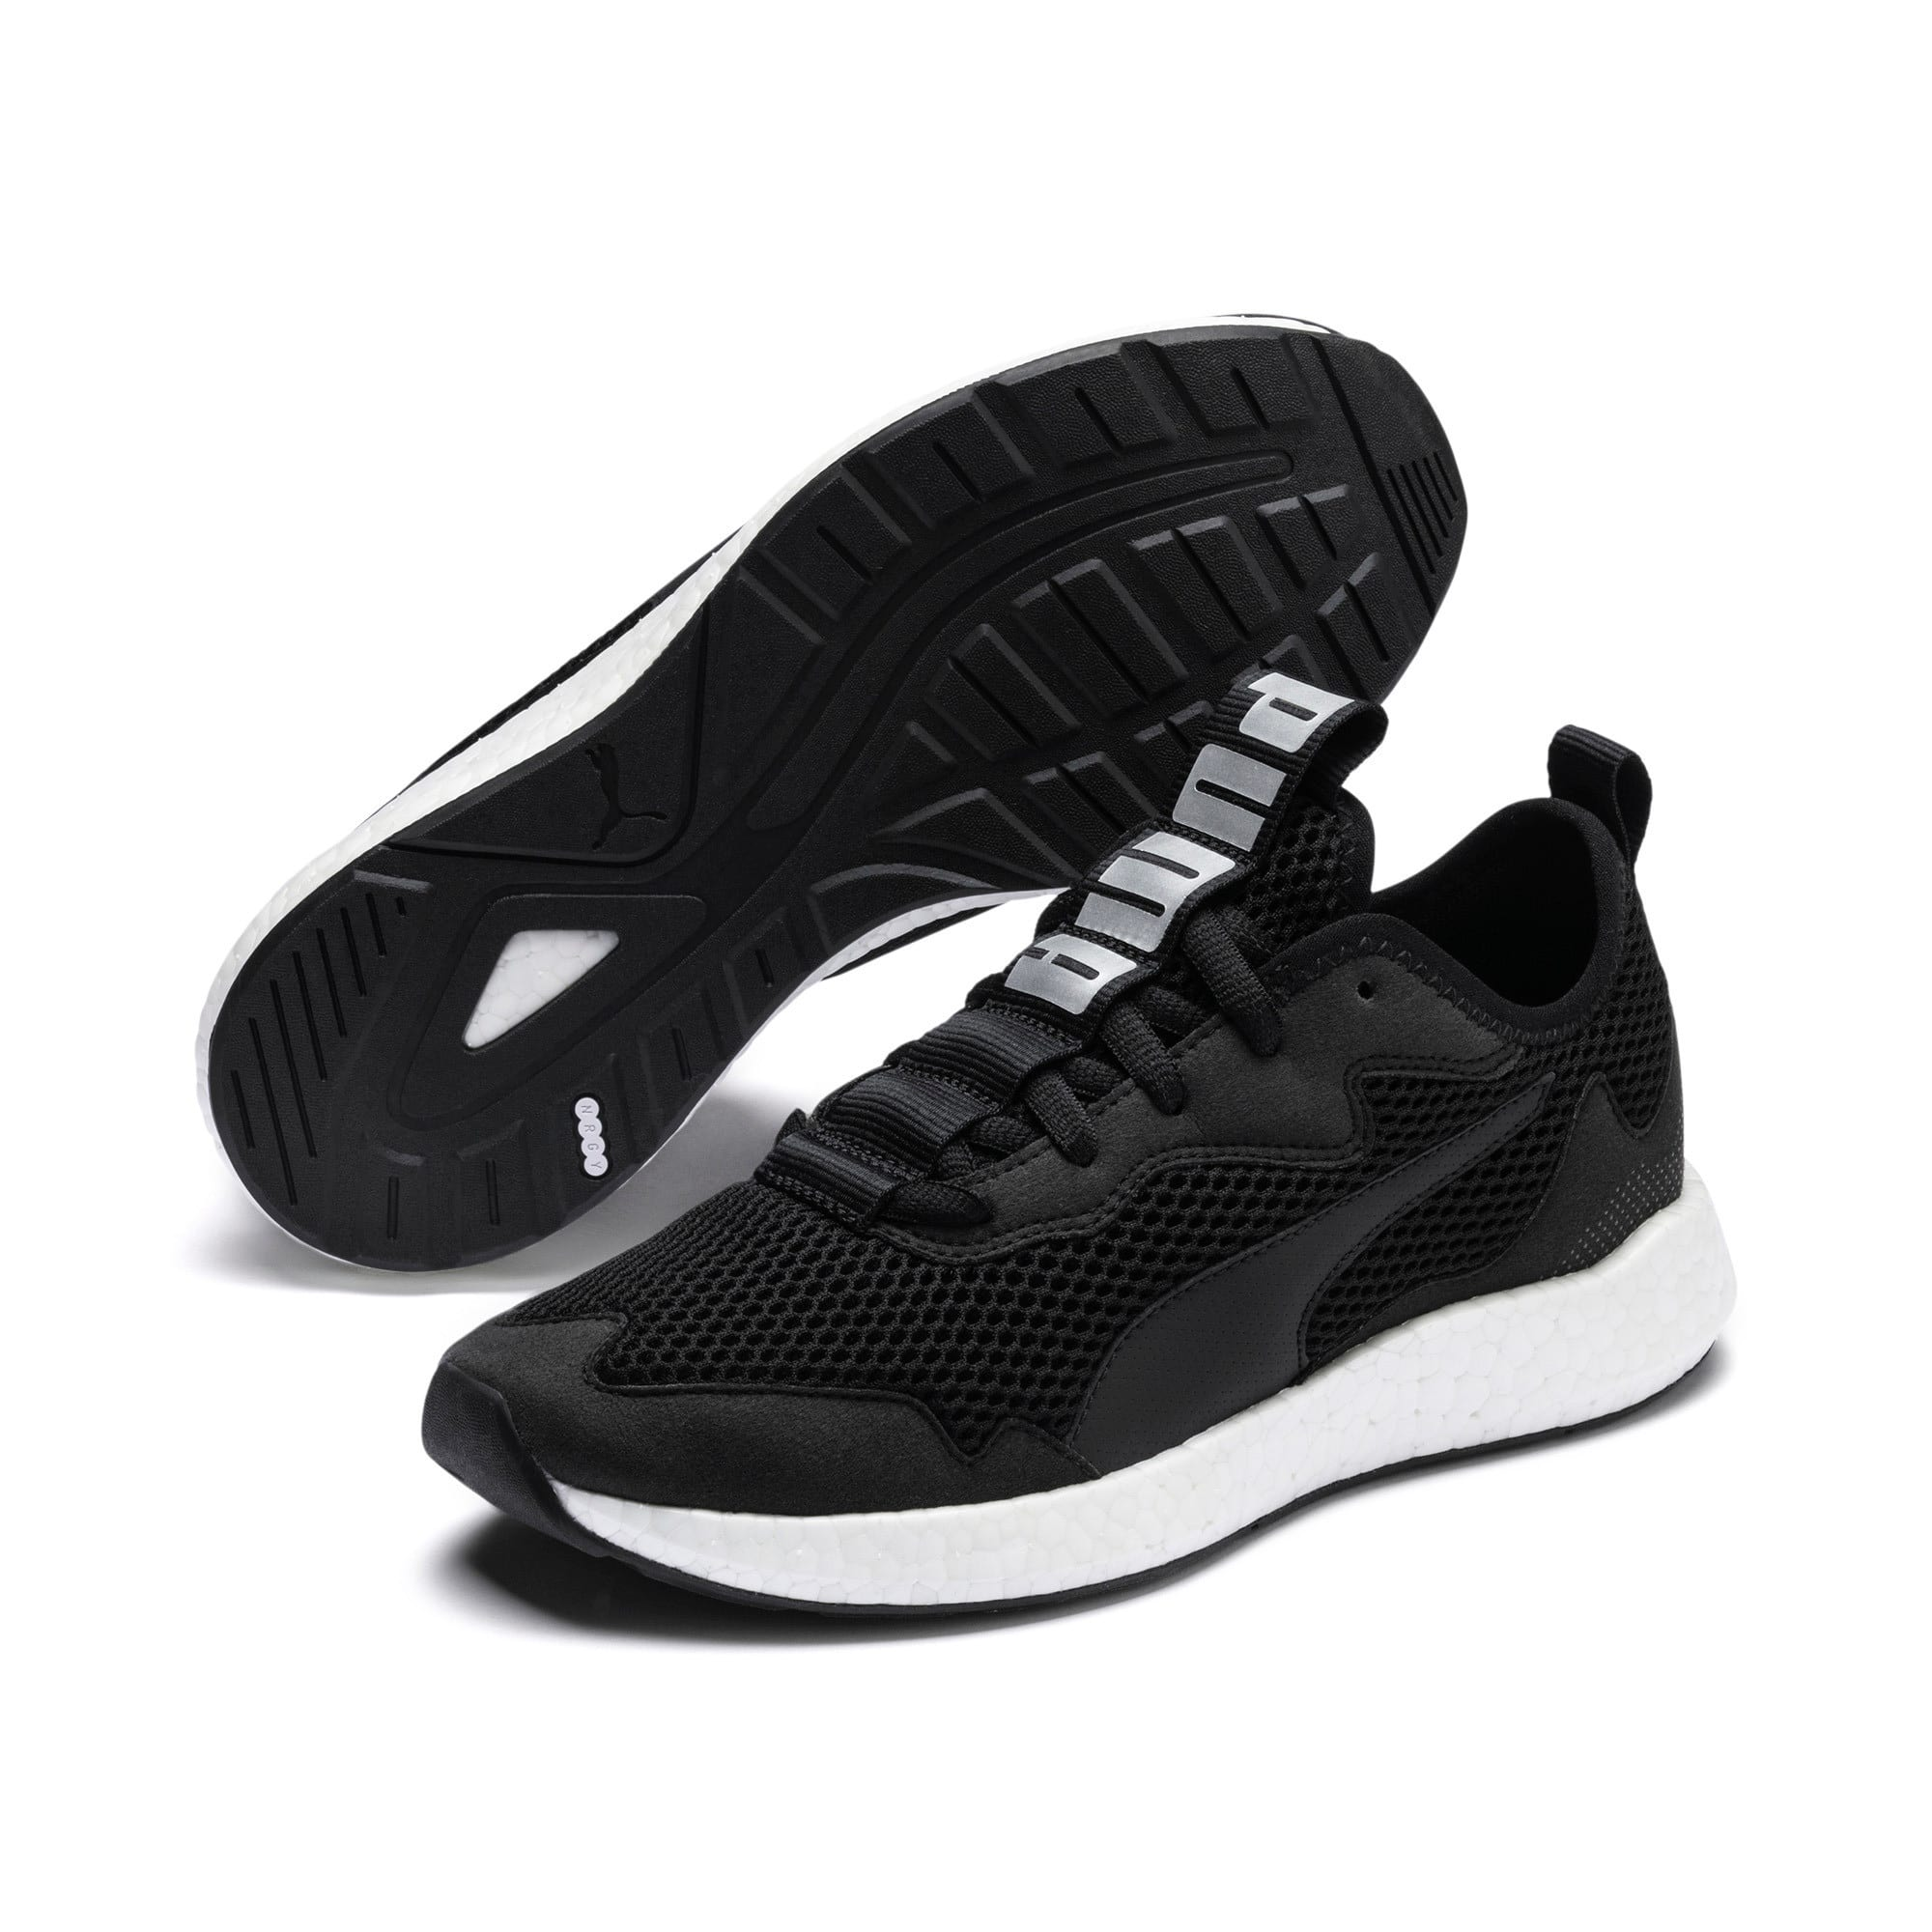 Thumbnail 3 of NRGY Neko Skim Women's Running Shoes, Puma Black-Puma Silver, medium